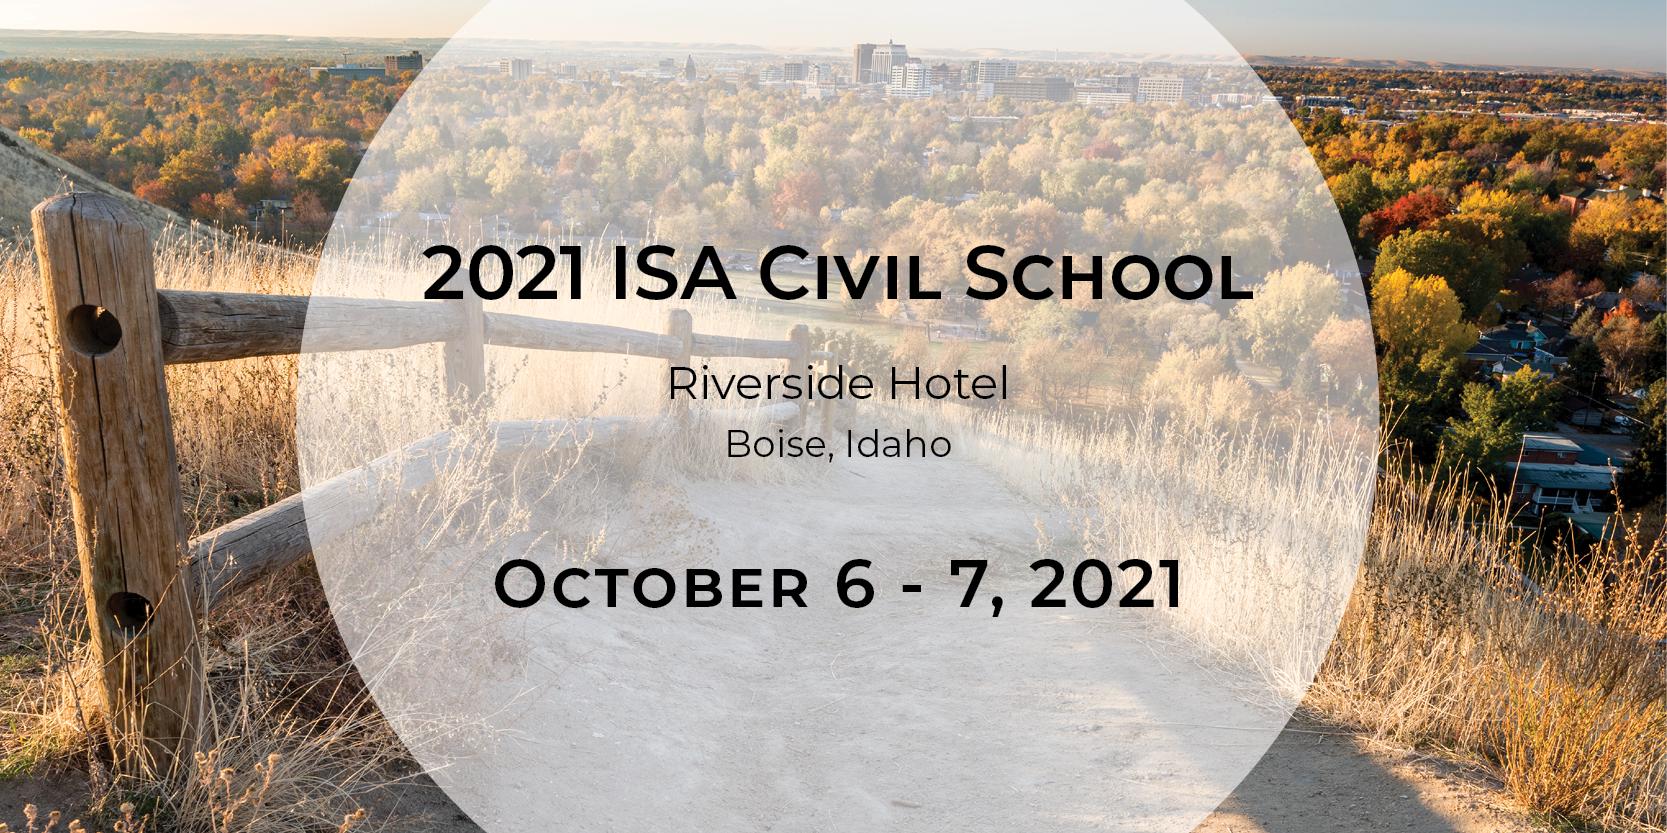 2021 ISA Civil School